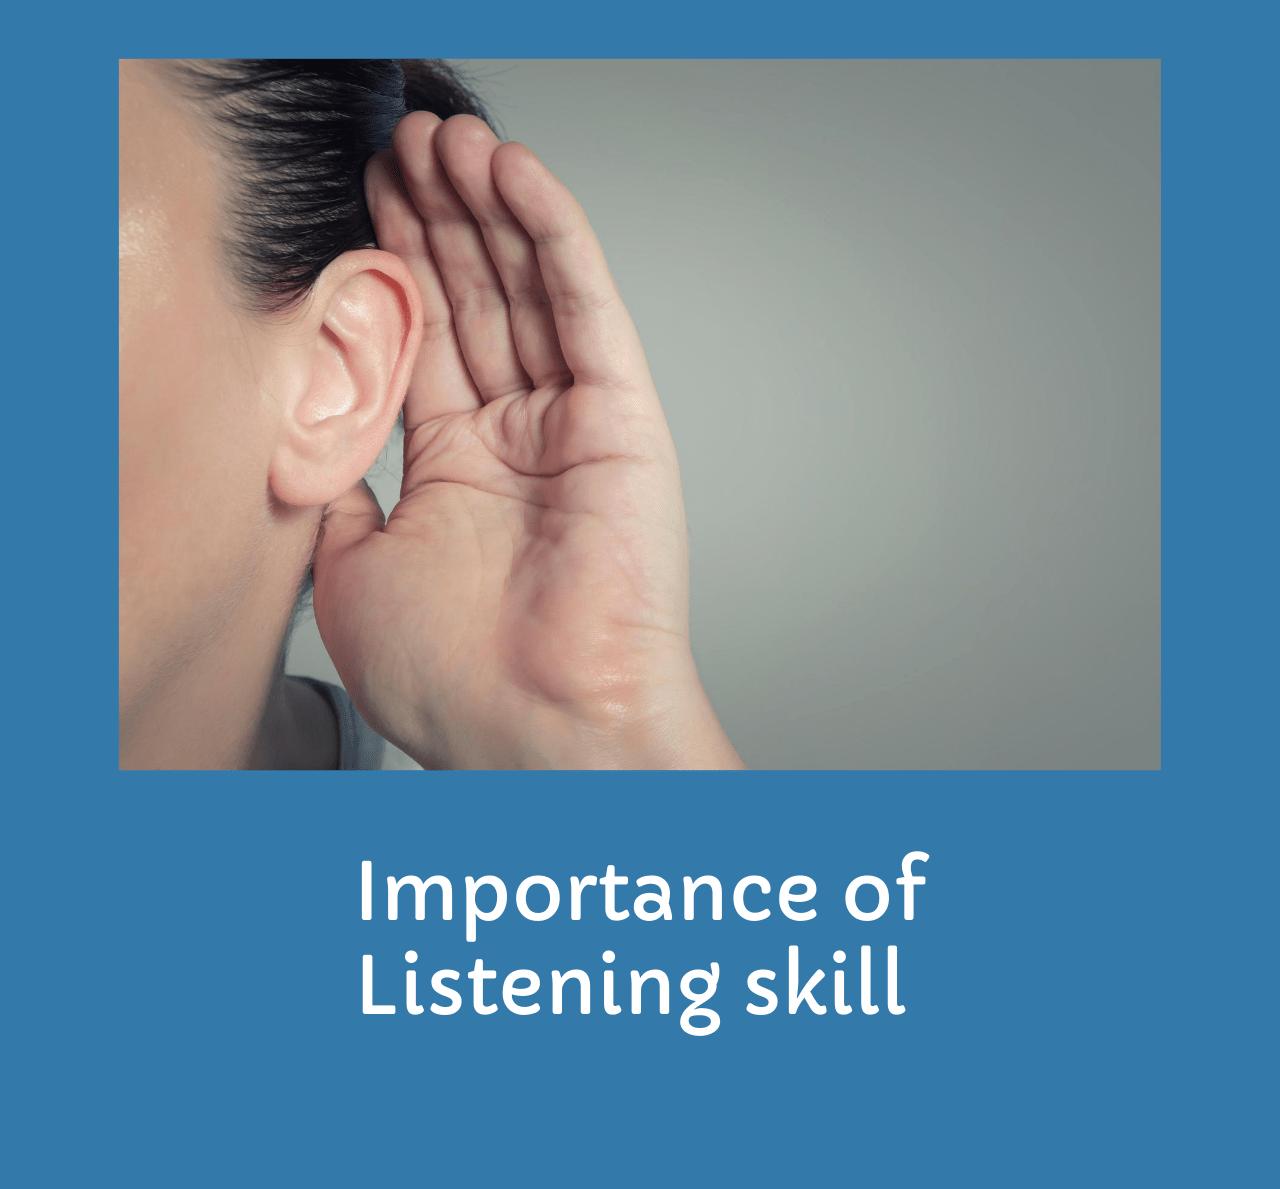 Importance of listening